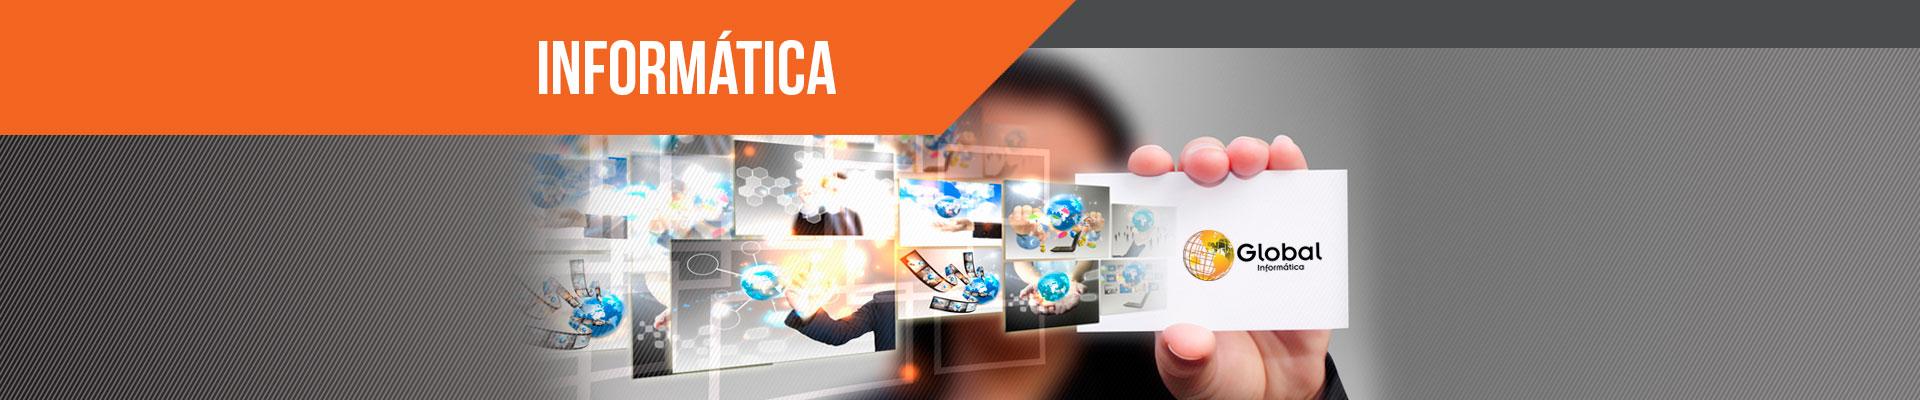 Informática - Global Informática